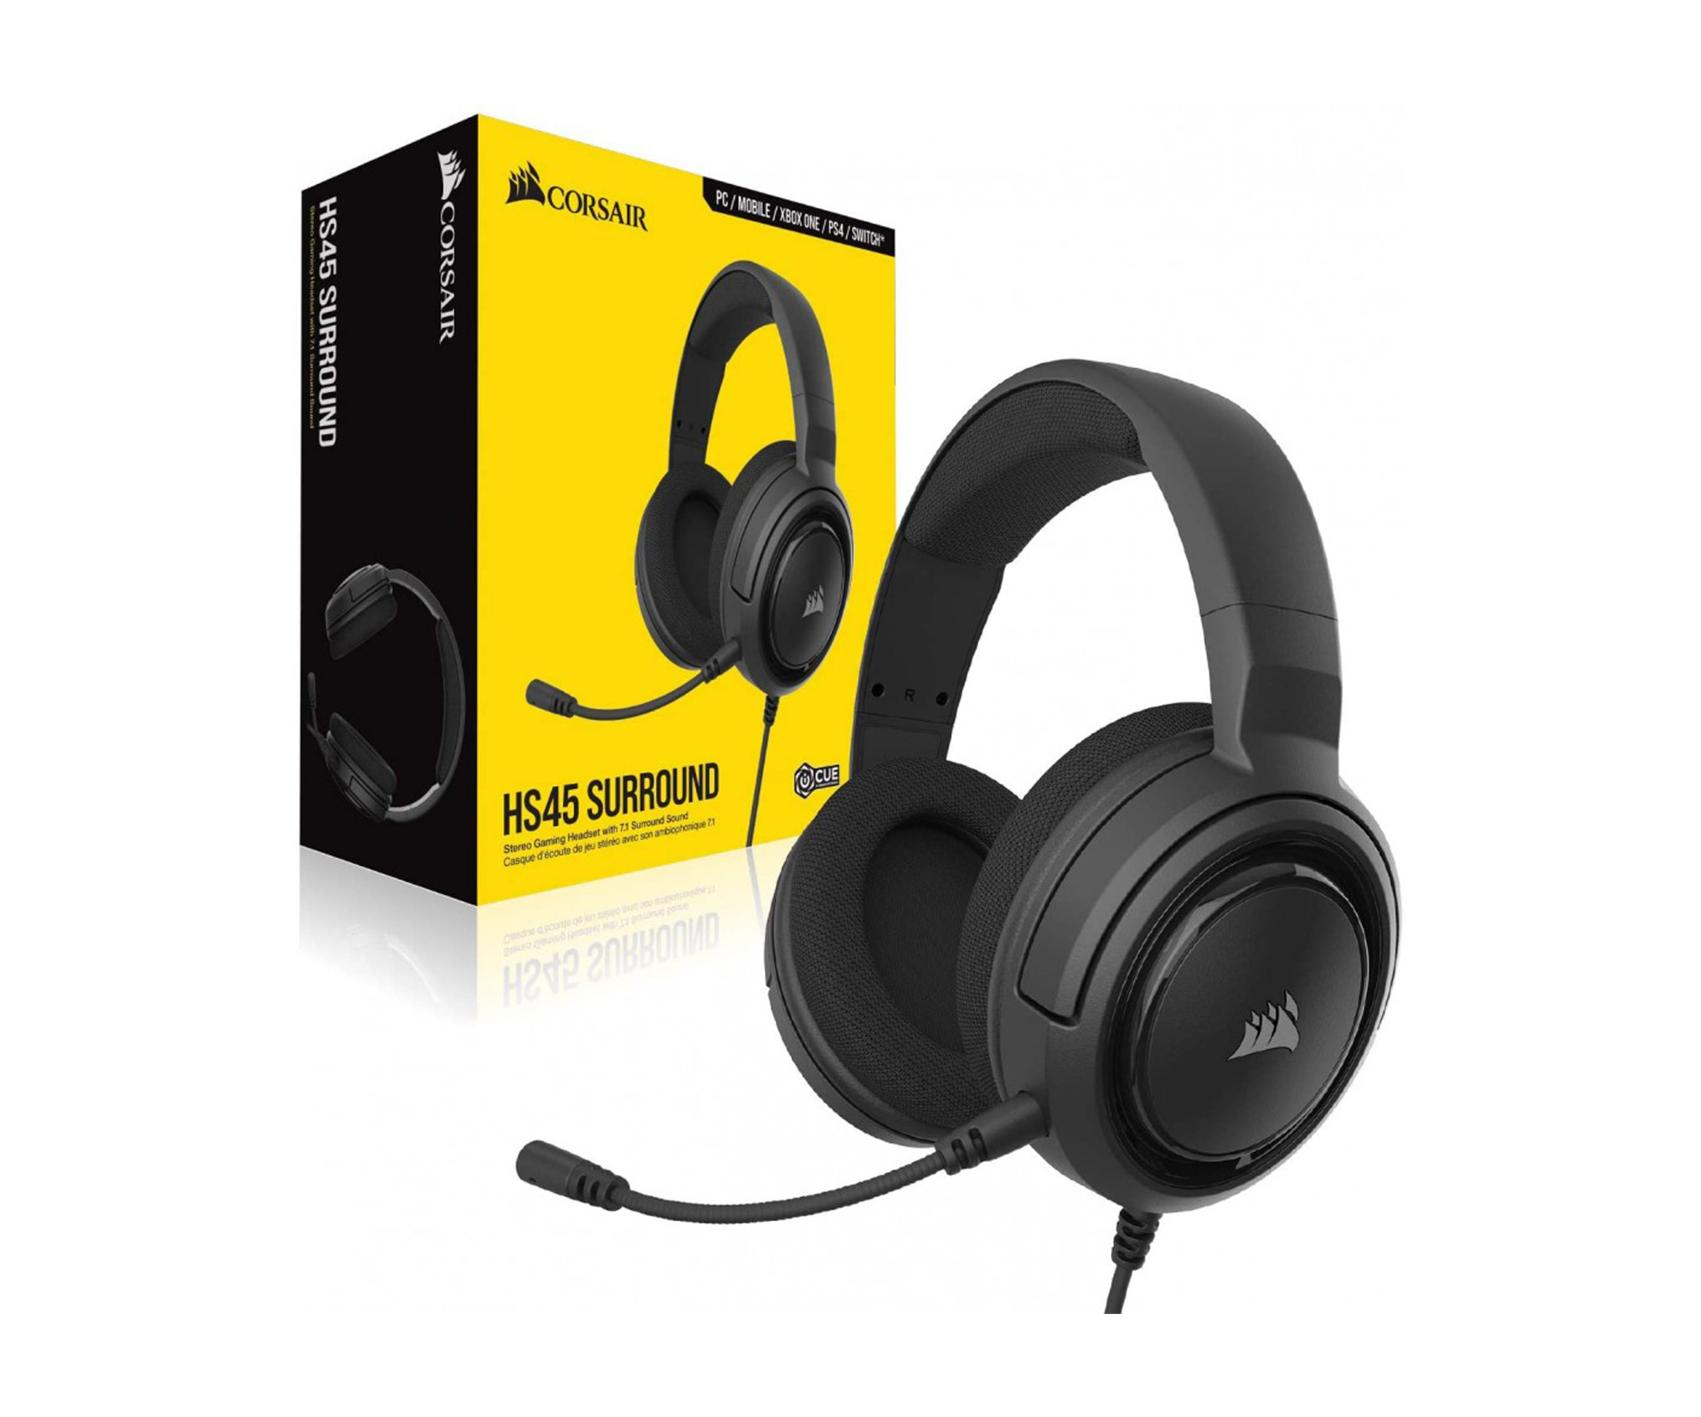 Corsair HS45 SURROUND 7.1 Gaming Headset — Carbon